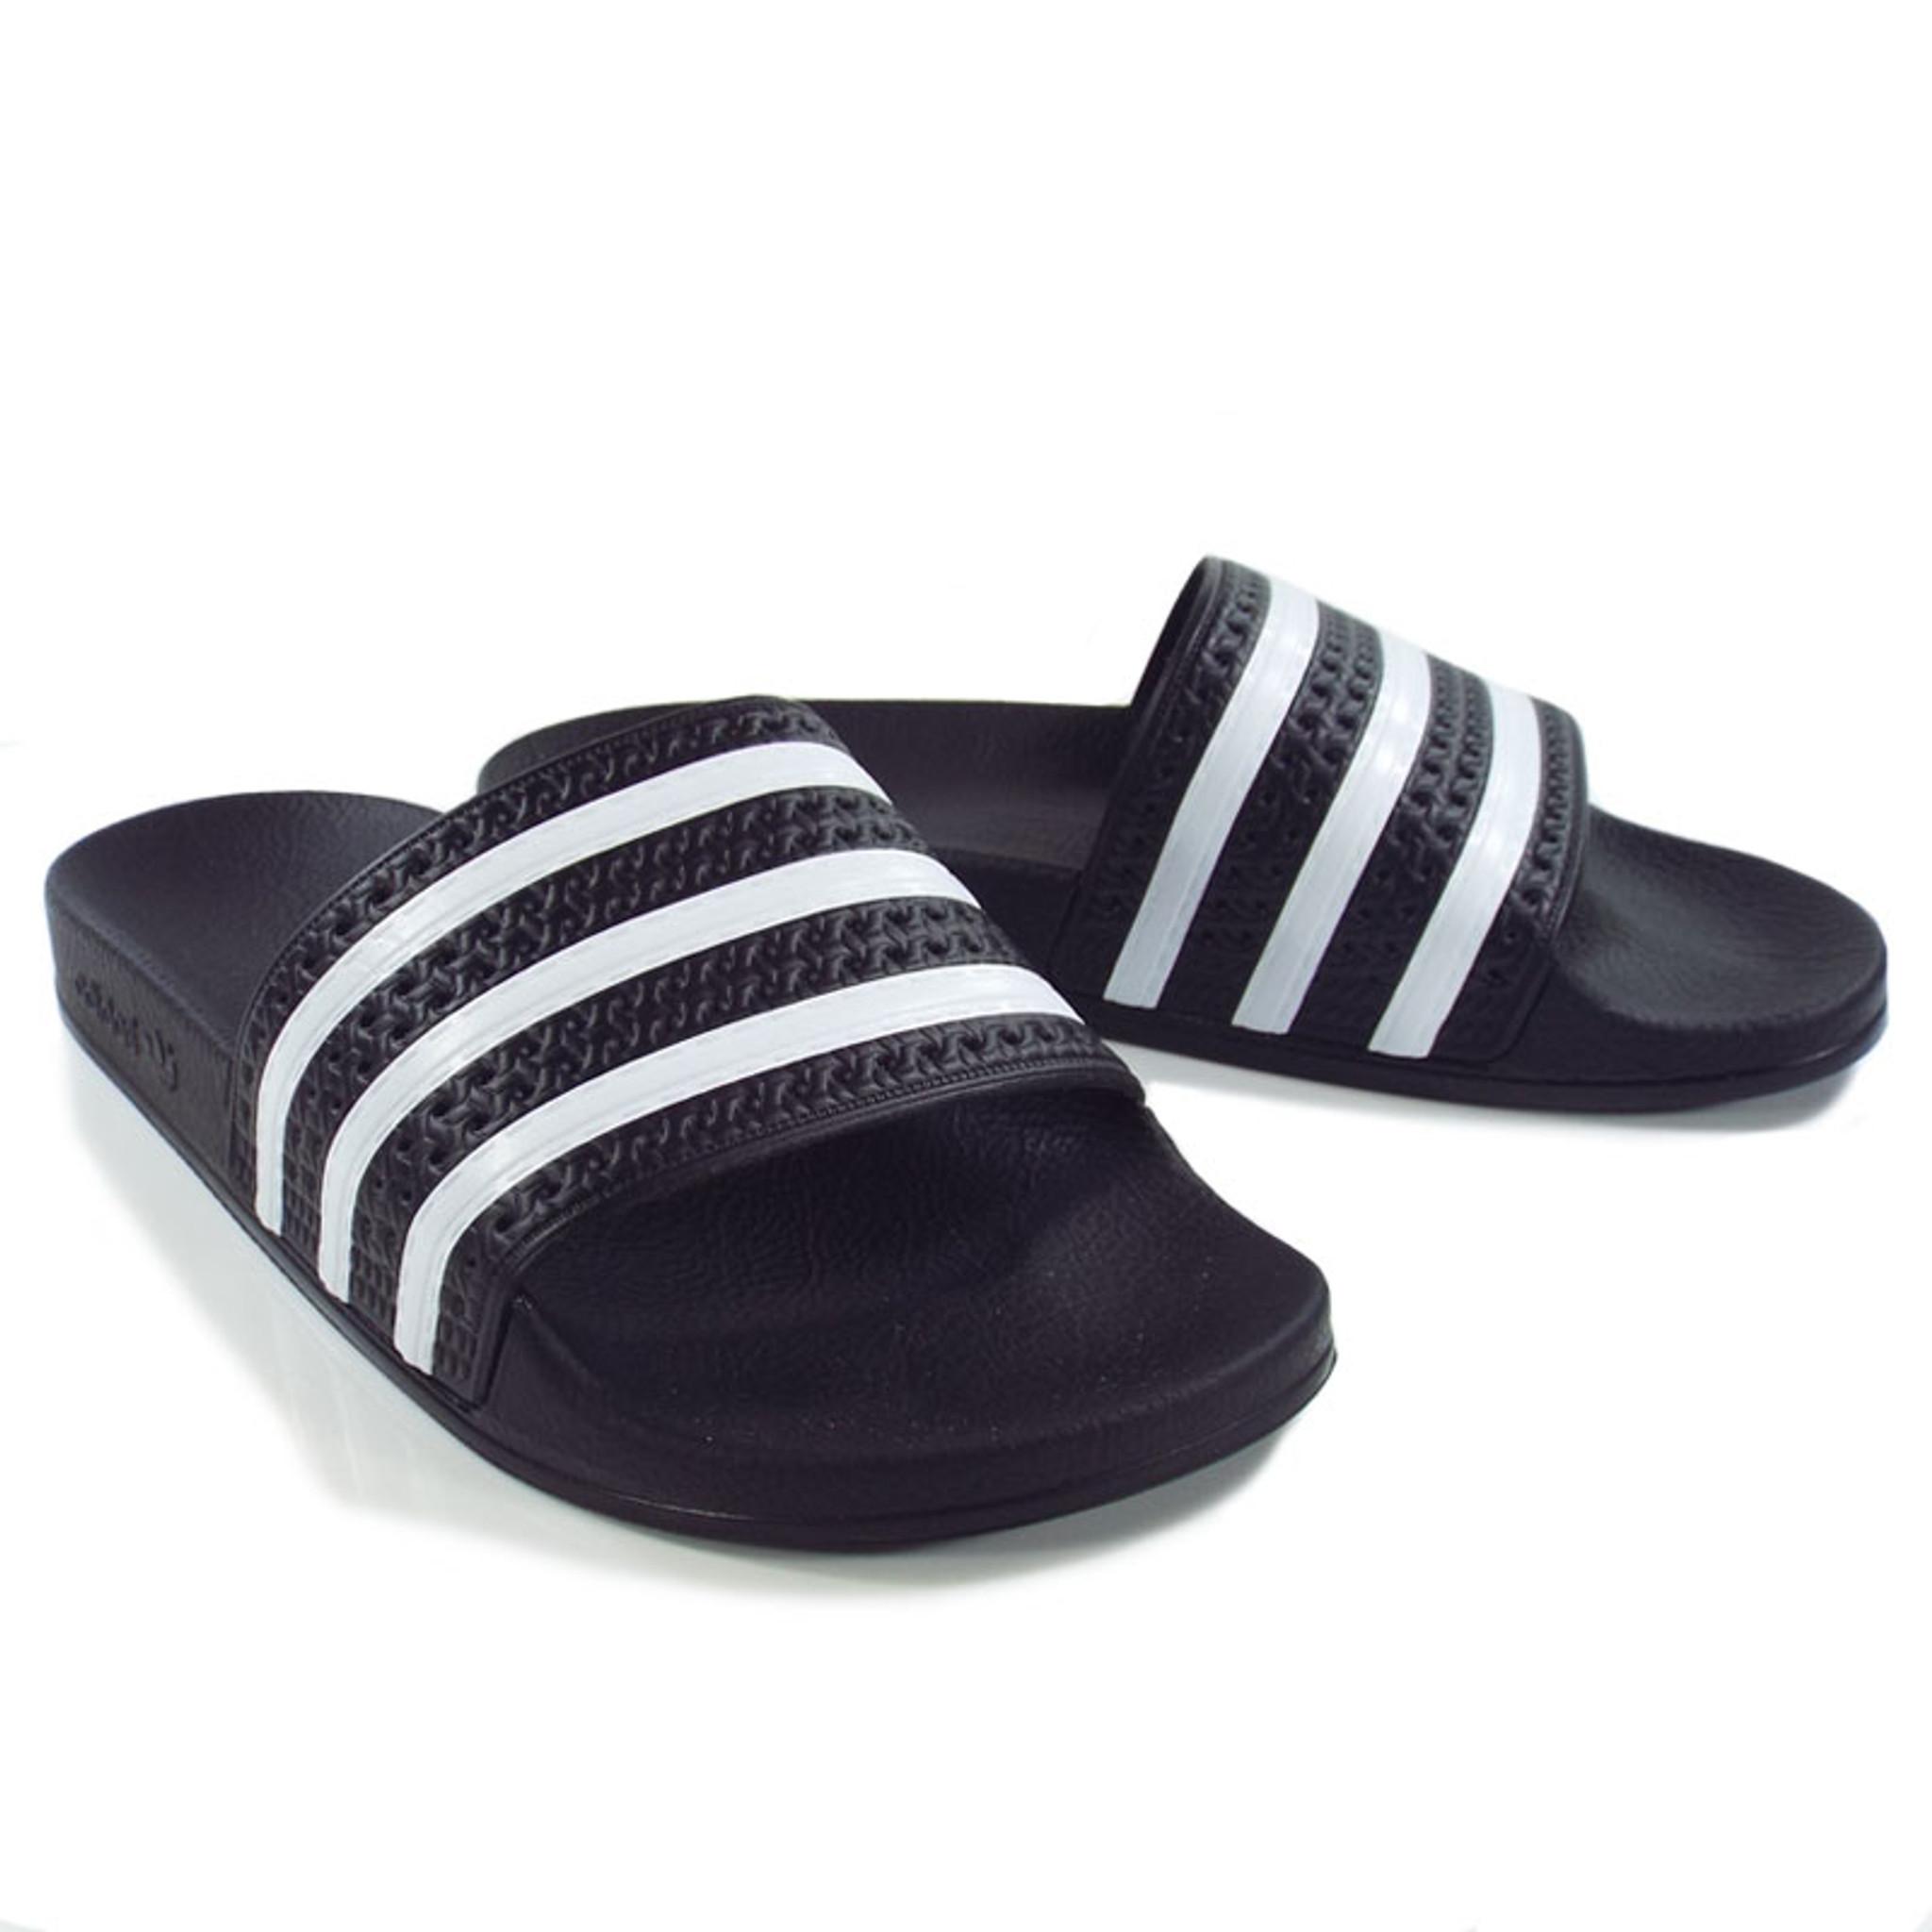 3d59c4c48696 Adidas Originals Adilette Slides - Black White - Detroit City ...